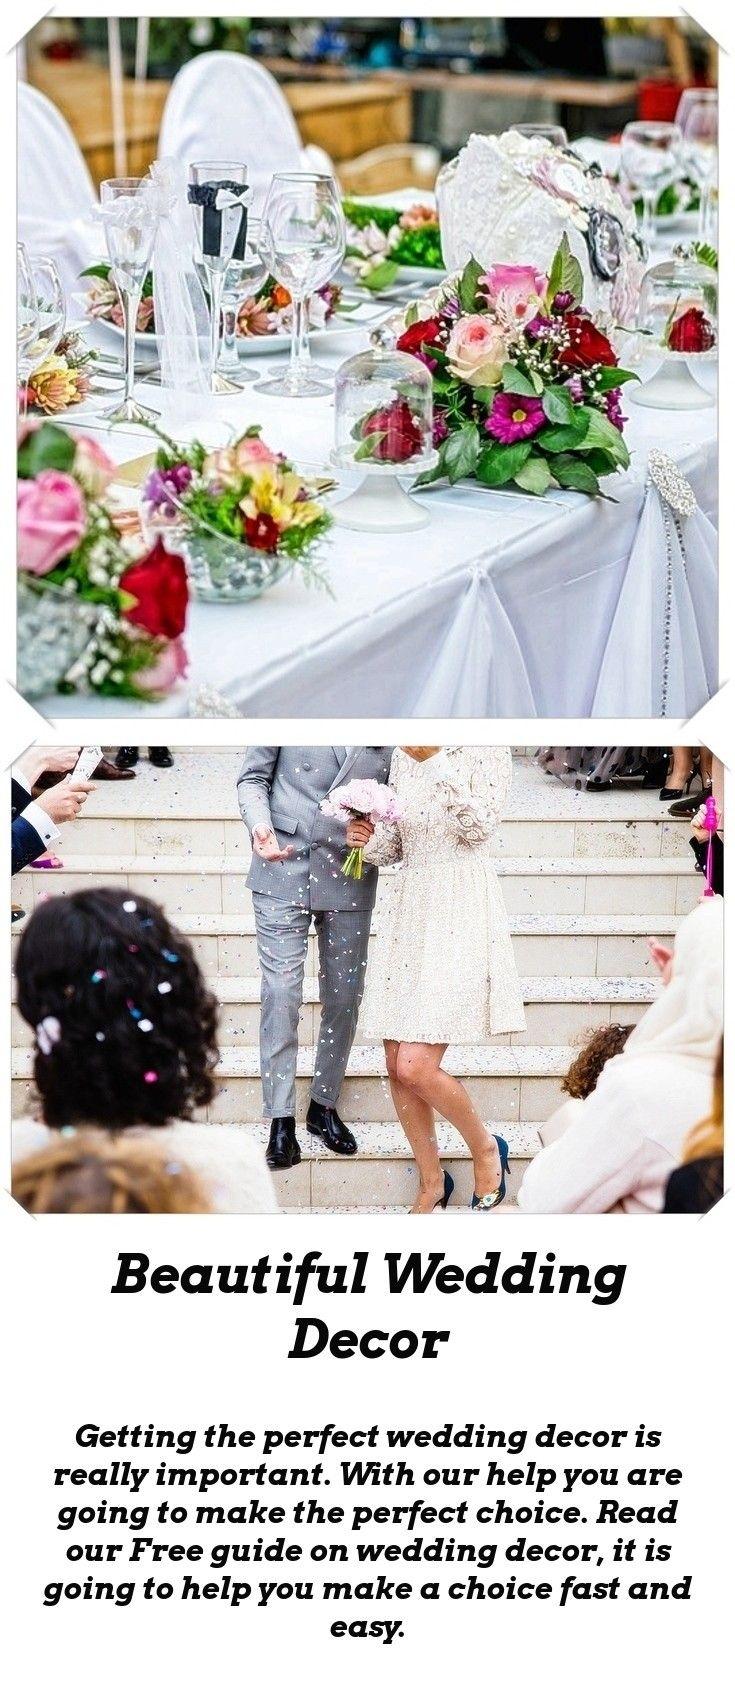 Wedding decorations to make  Decor For Wedding  Pinterest